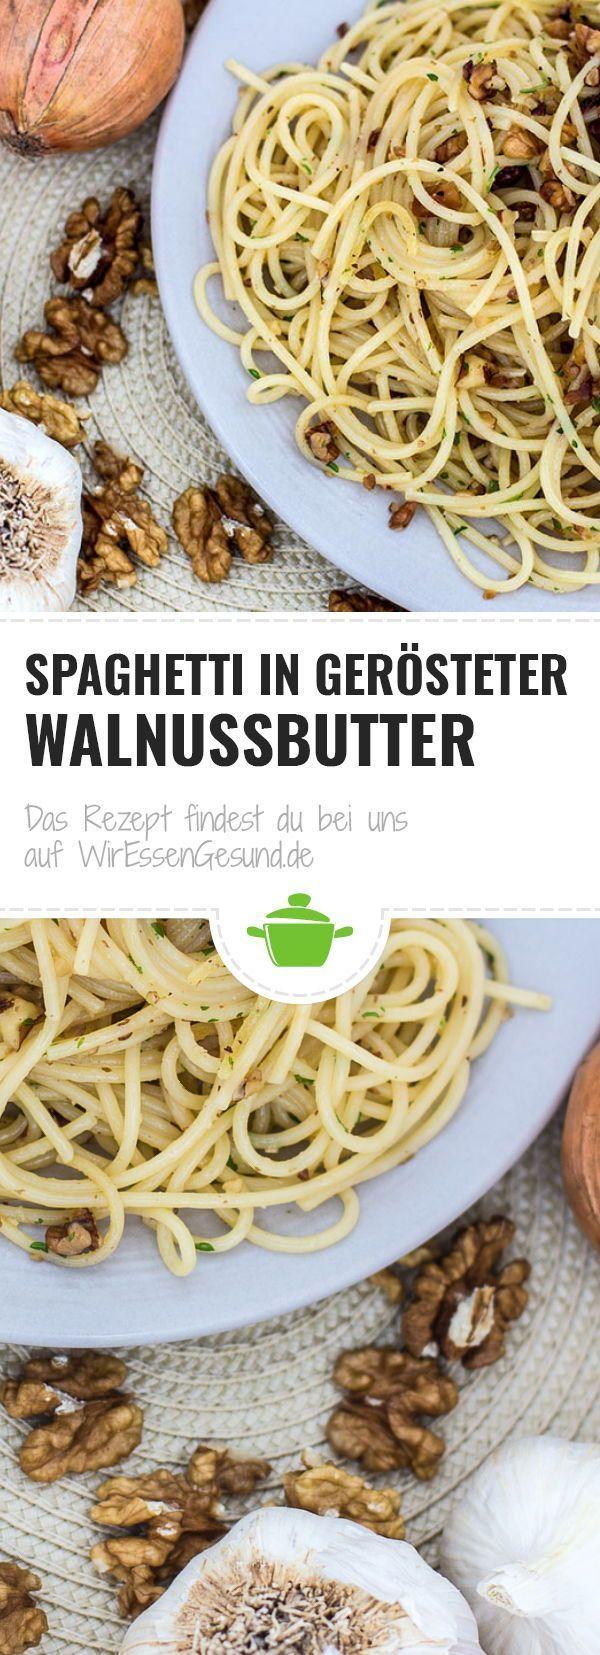 Spaghetti in gerösteter Walnussbutter